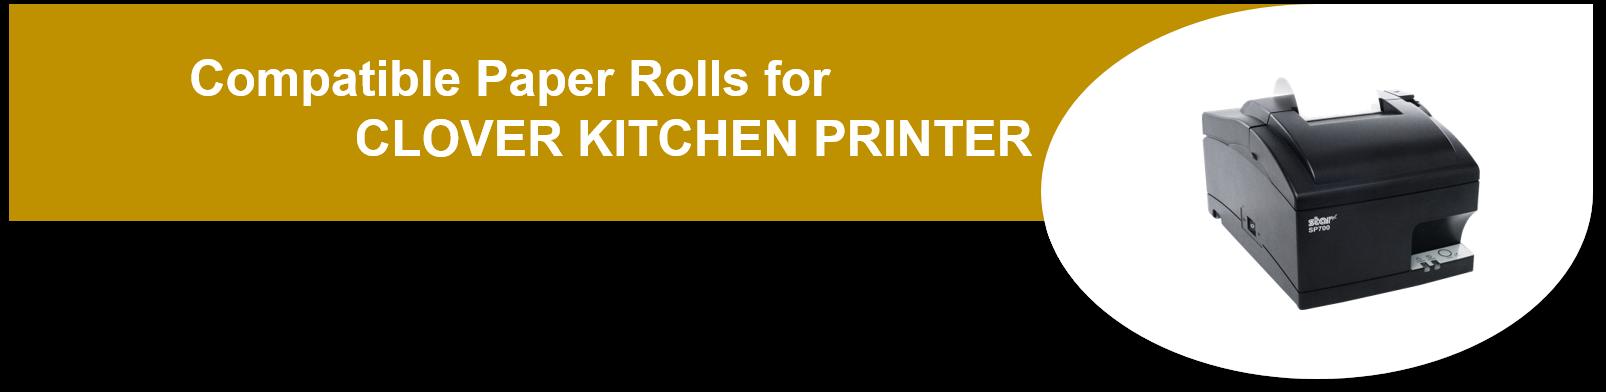 clover-kitchen-printer-banner.png